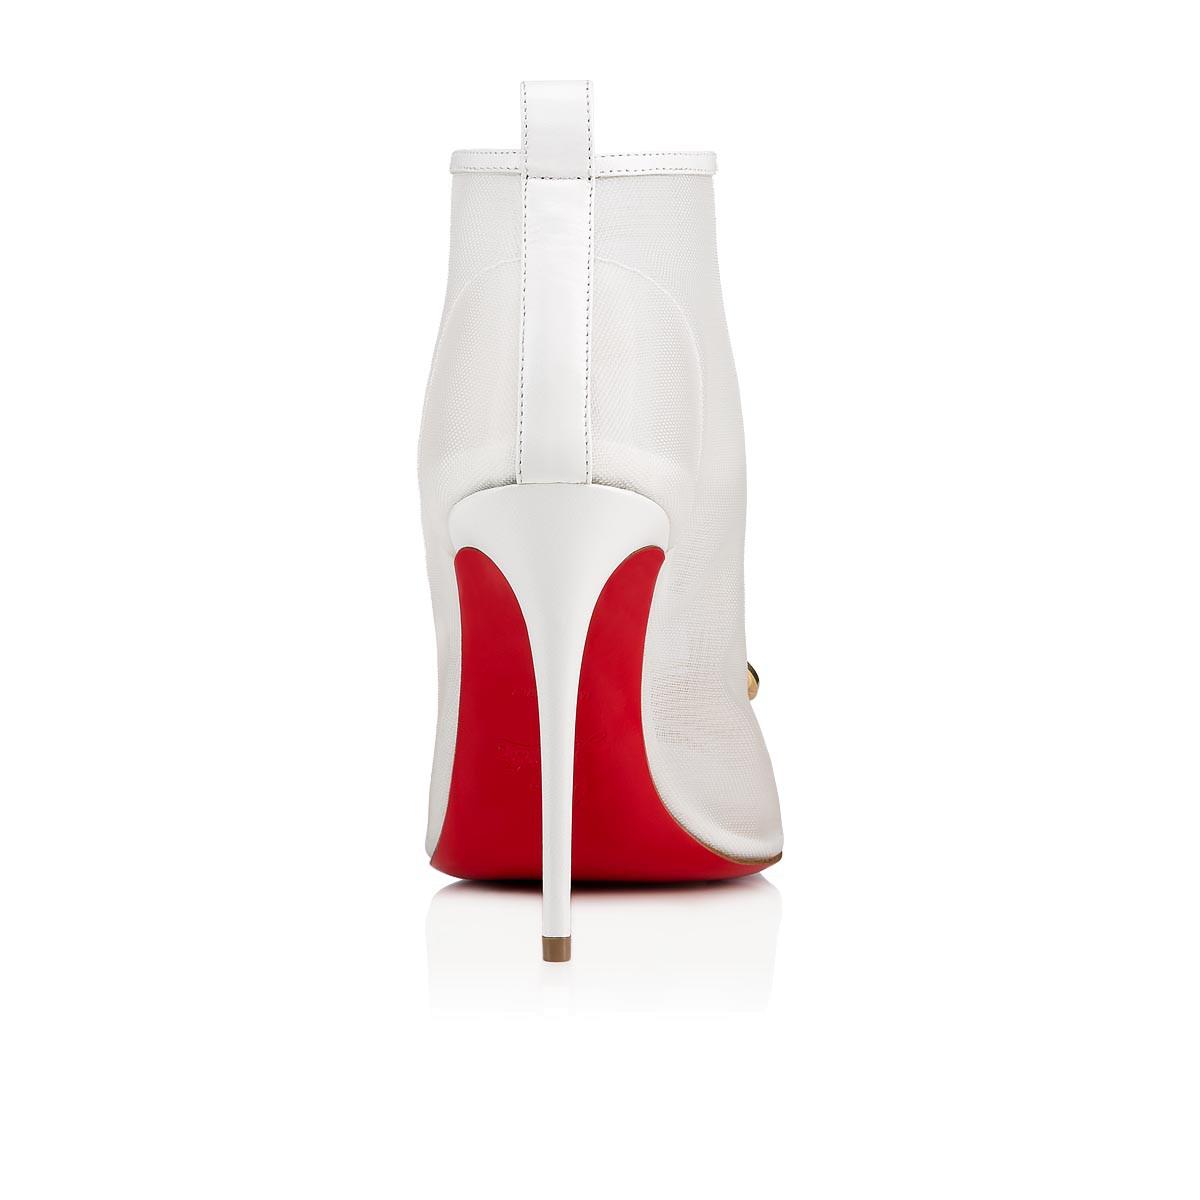 Shoes - Marikate - Christian Louboutin